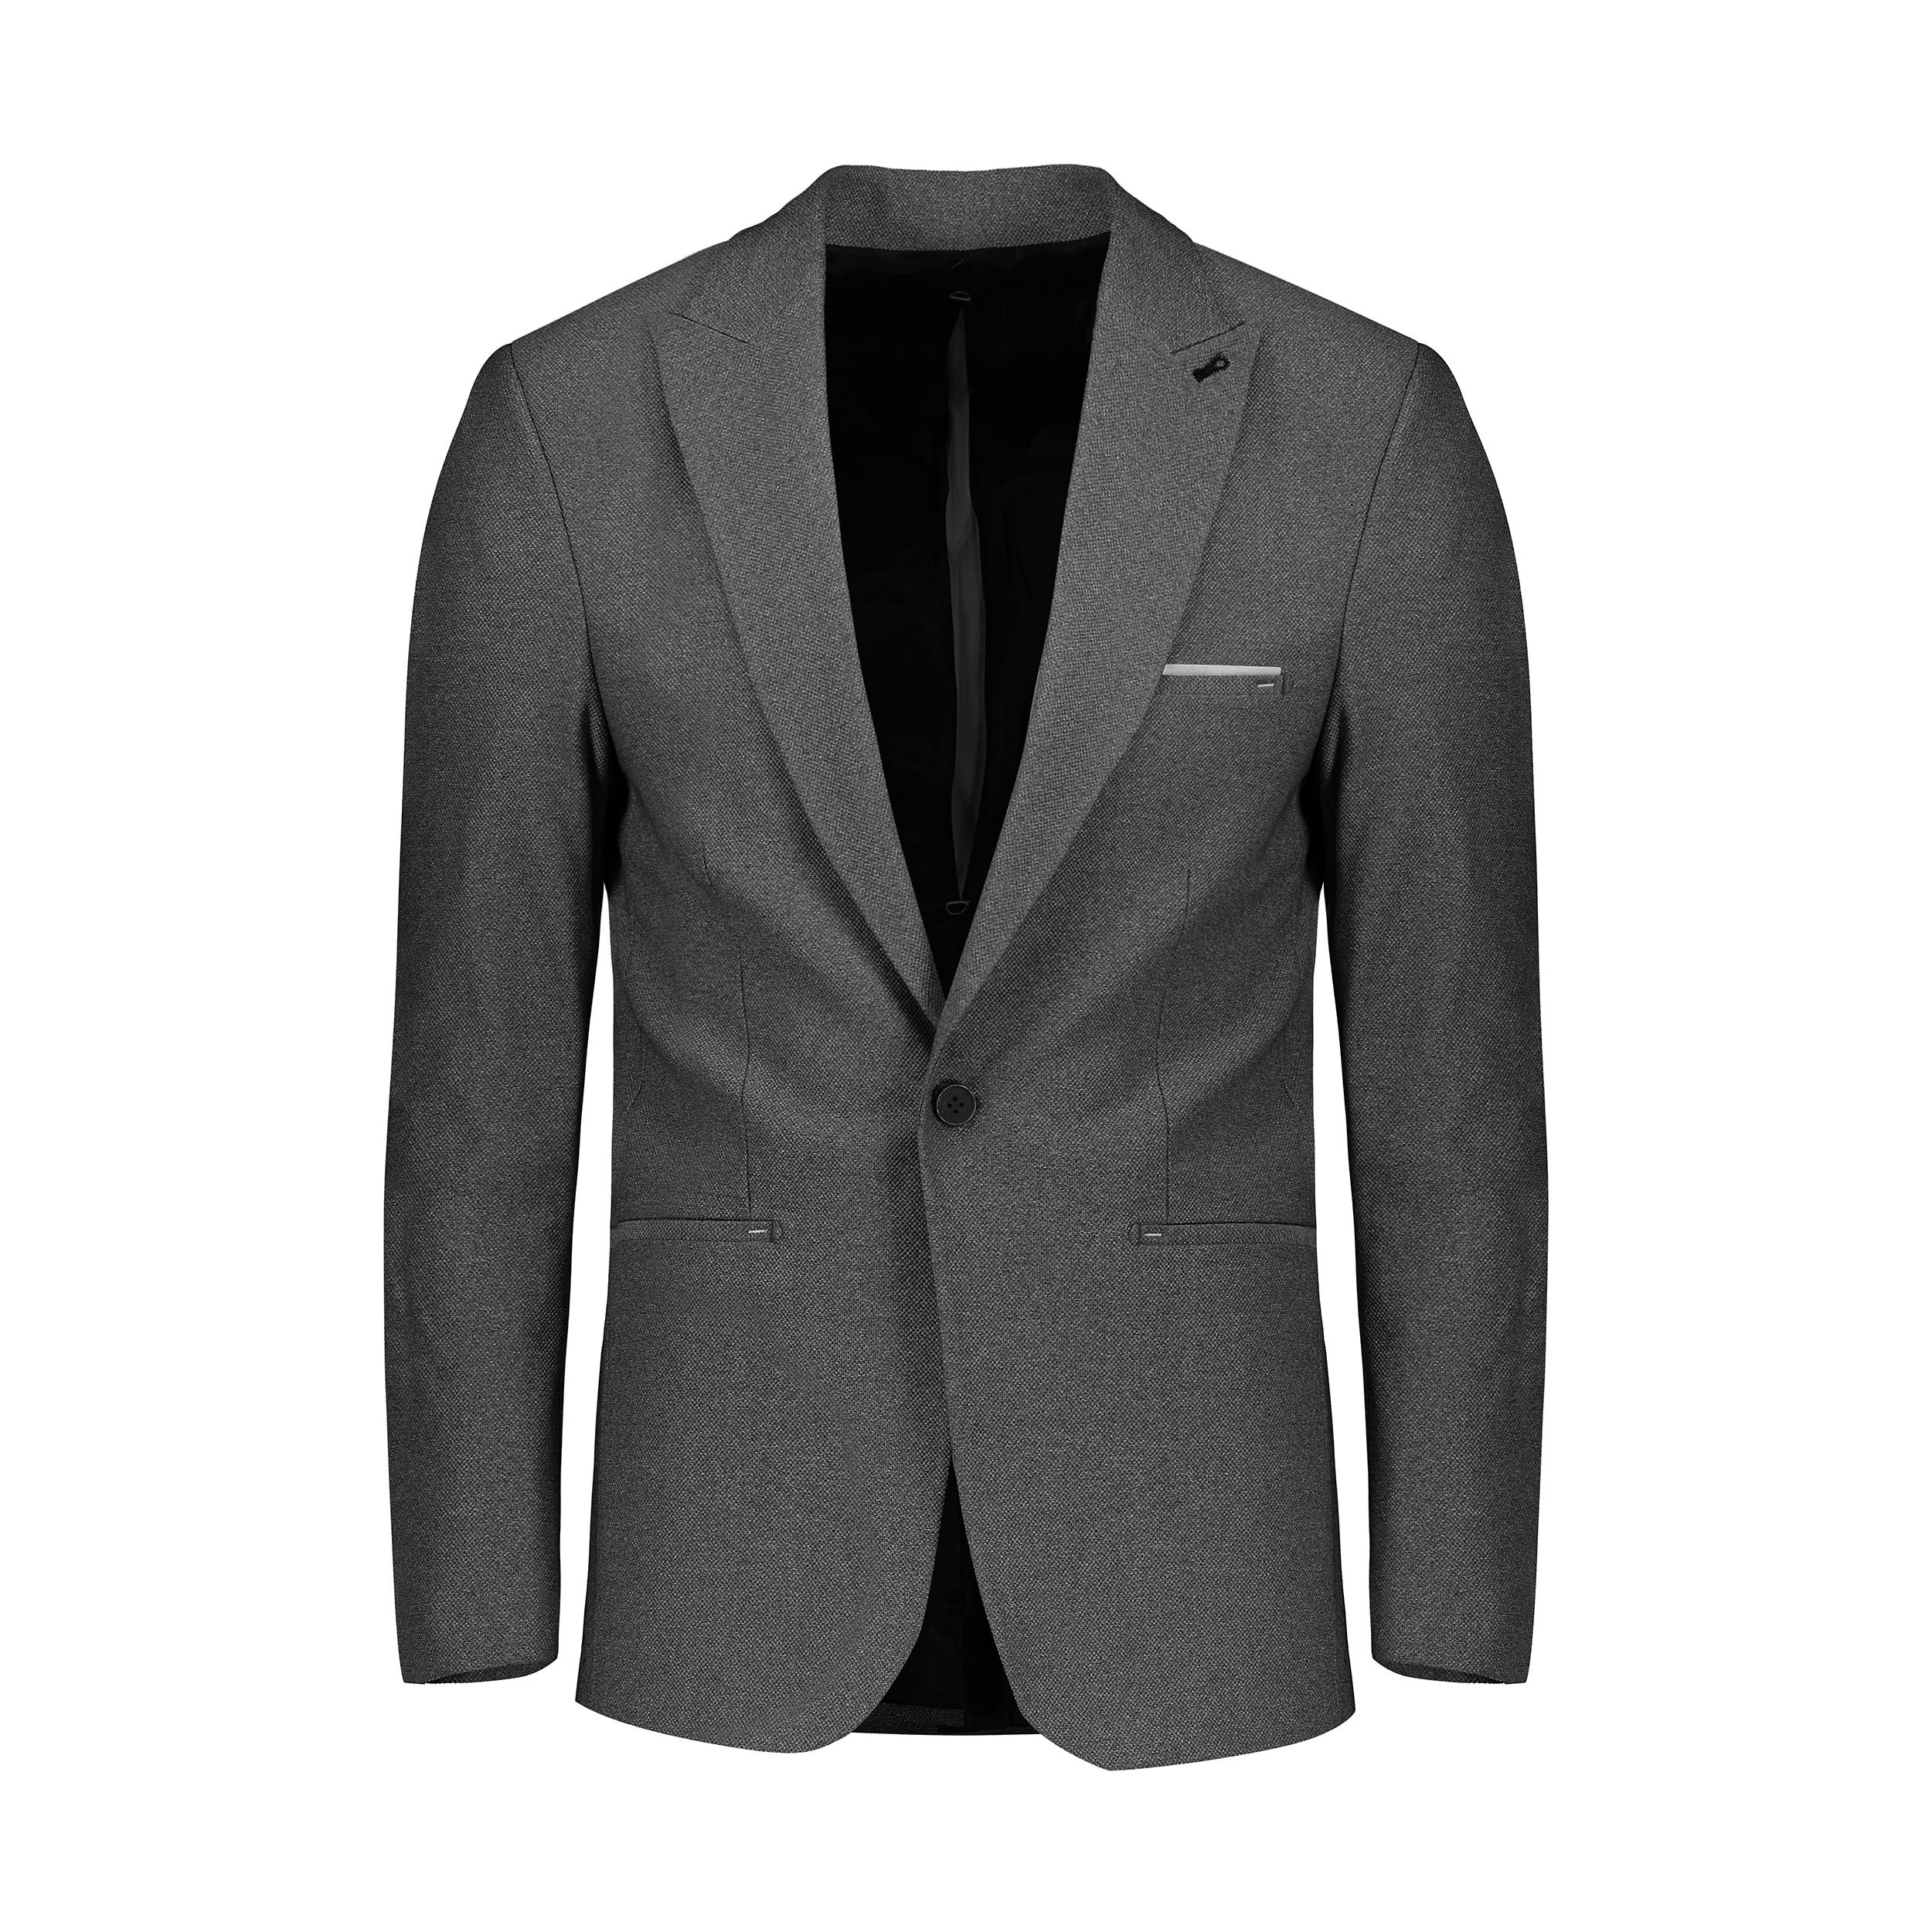 کت تک مردانه سردانالو مدل 10085g